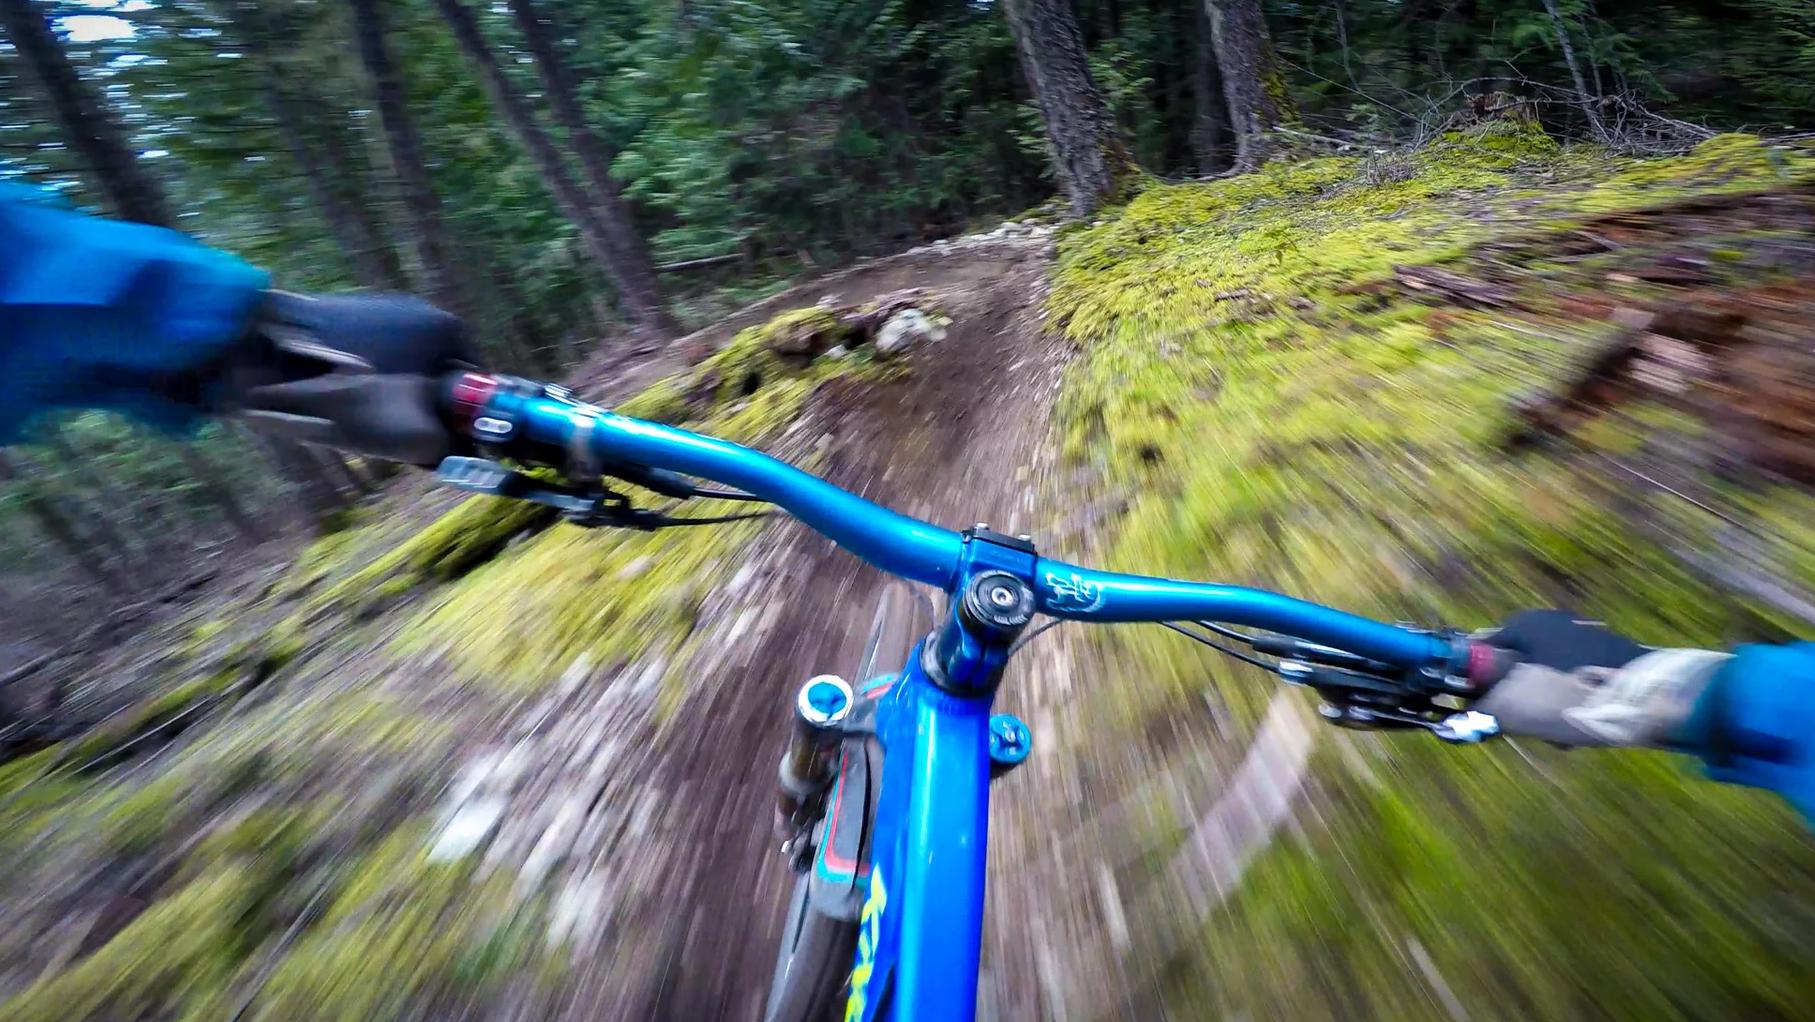 Pov Steve Storey Vs Bob Gnarly Bliss Turny Loamy Bliss Video Http Mount Best Mountain Bikes Downhill Mountain Biking Mountain Bike Brands